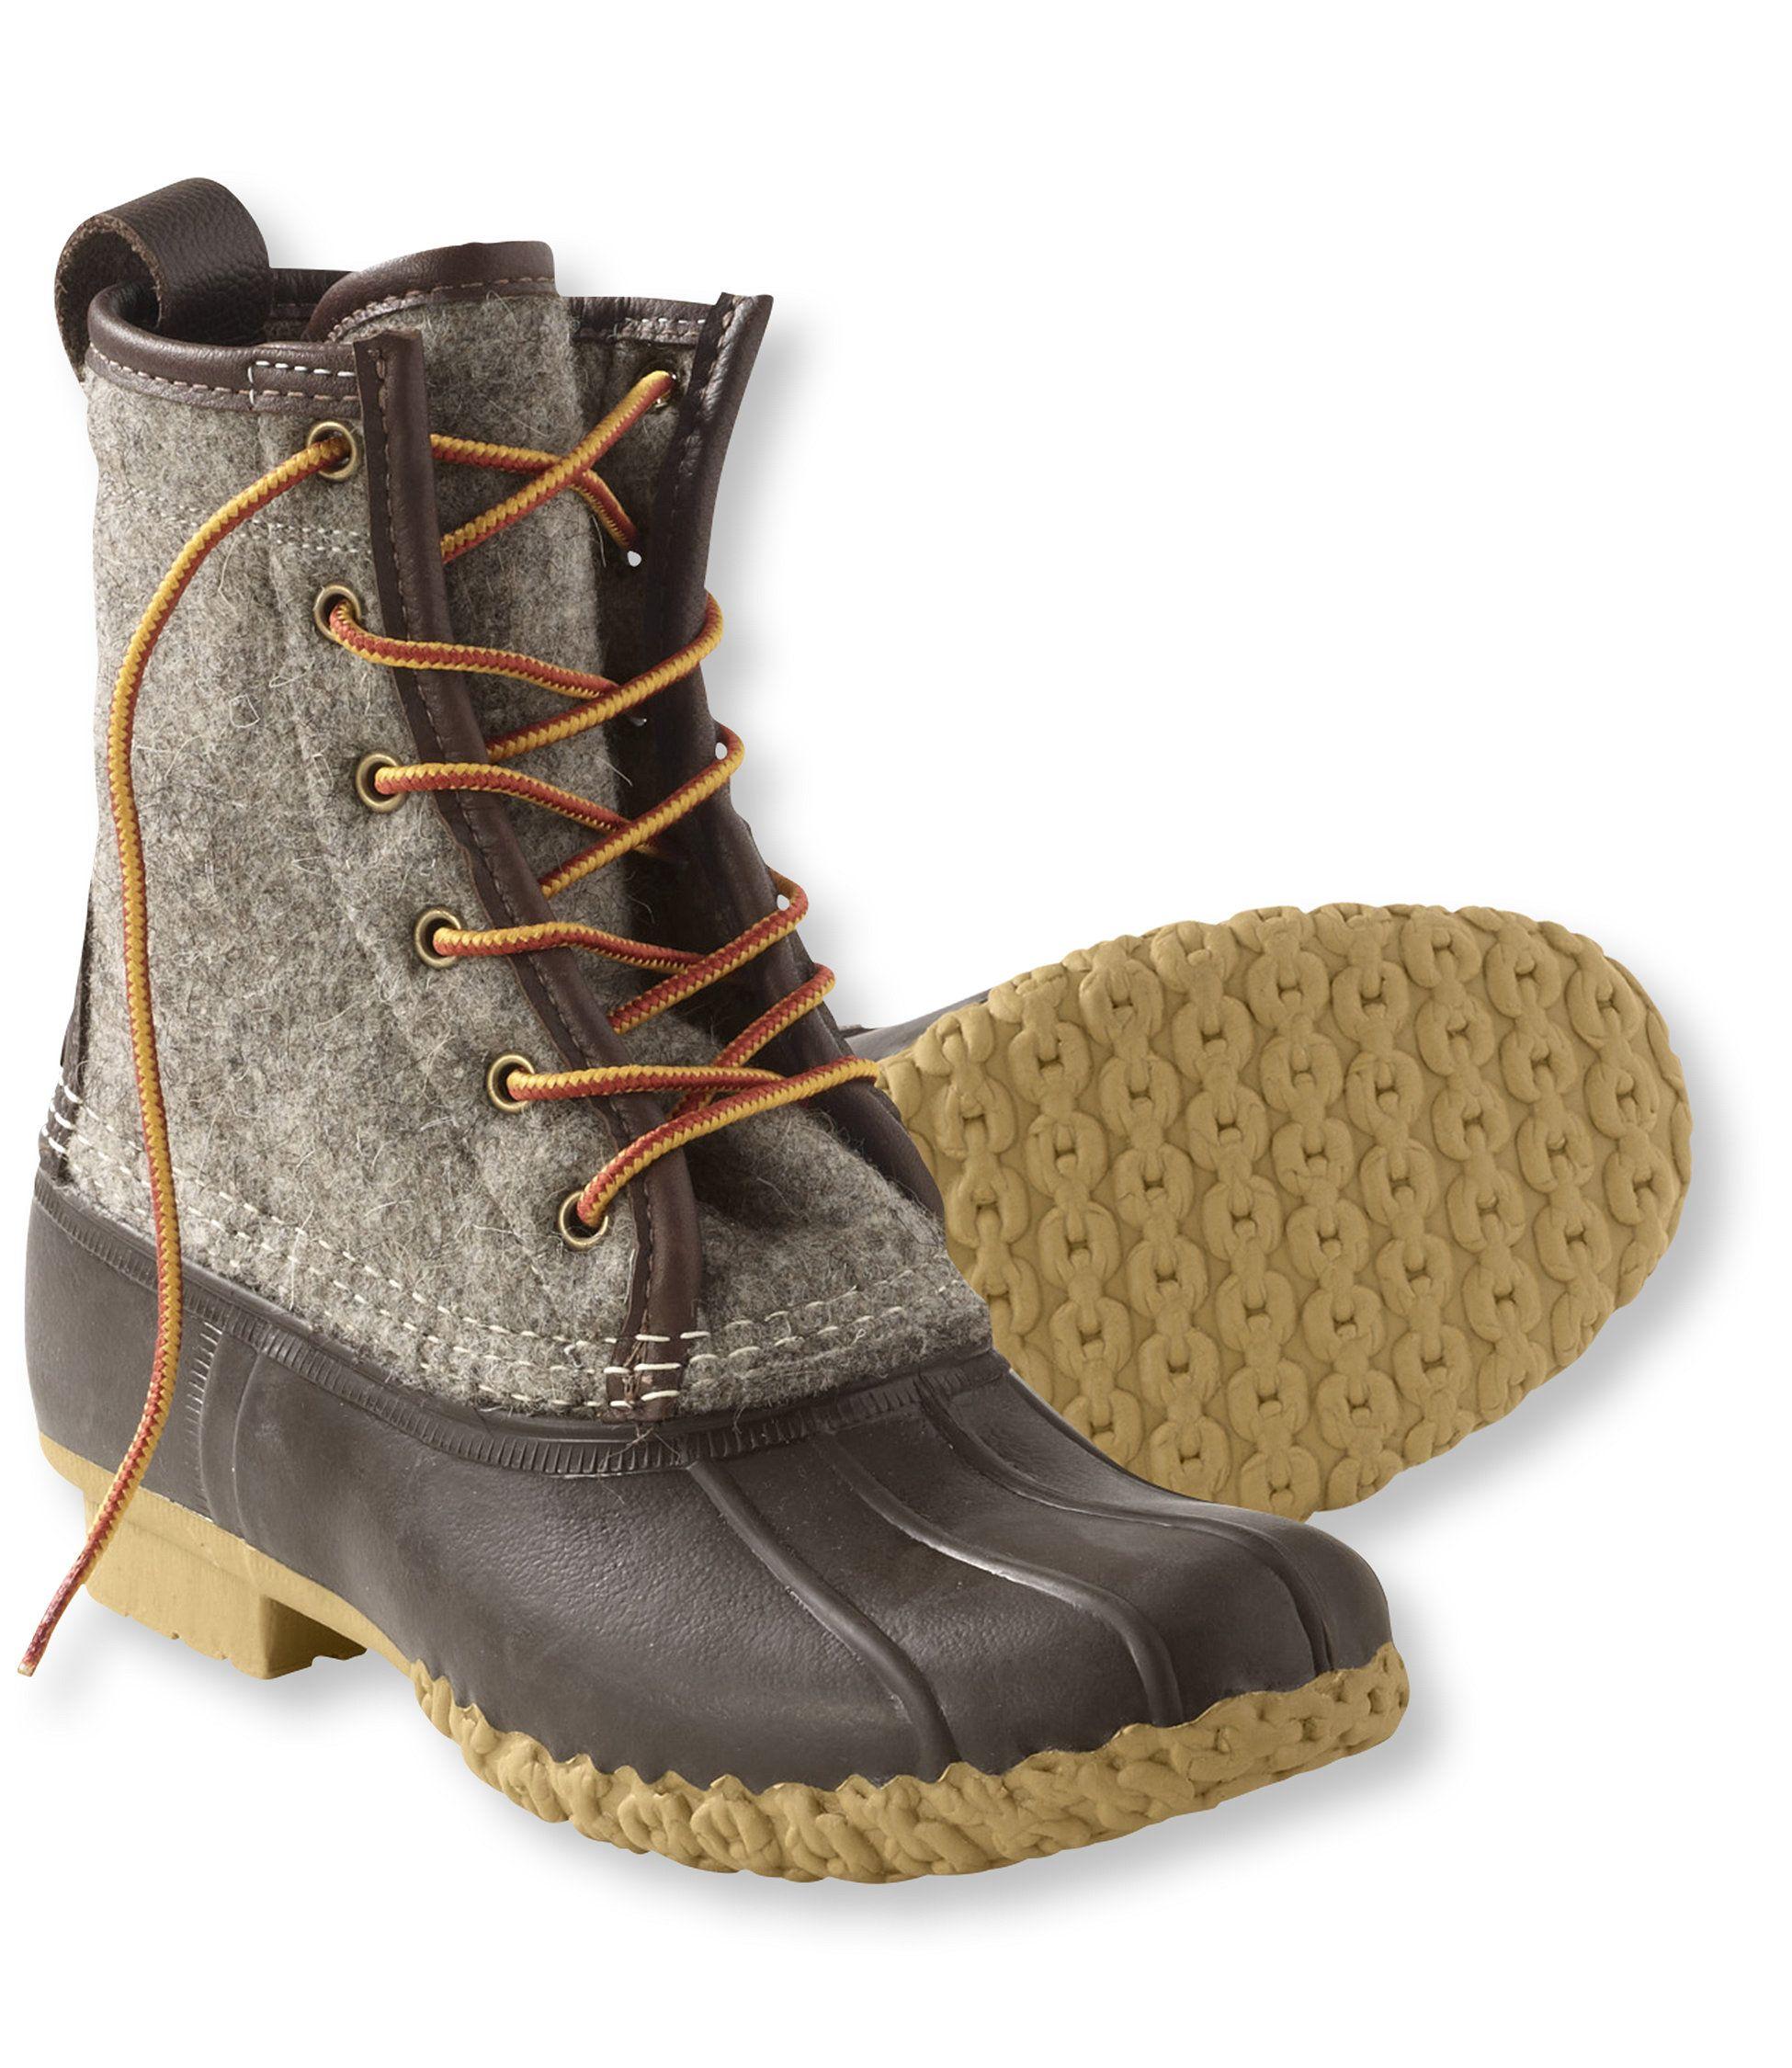 Felt Duck Boots Llbean My Style Pinterest Boots